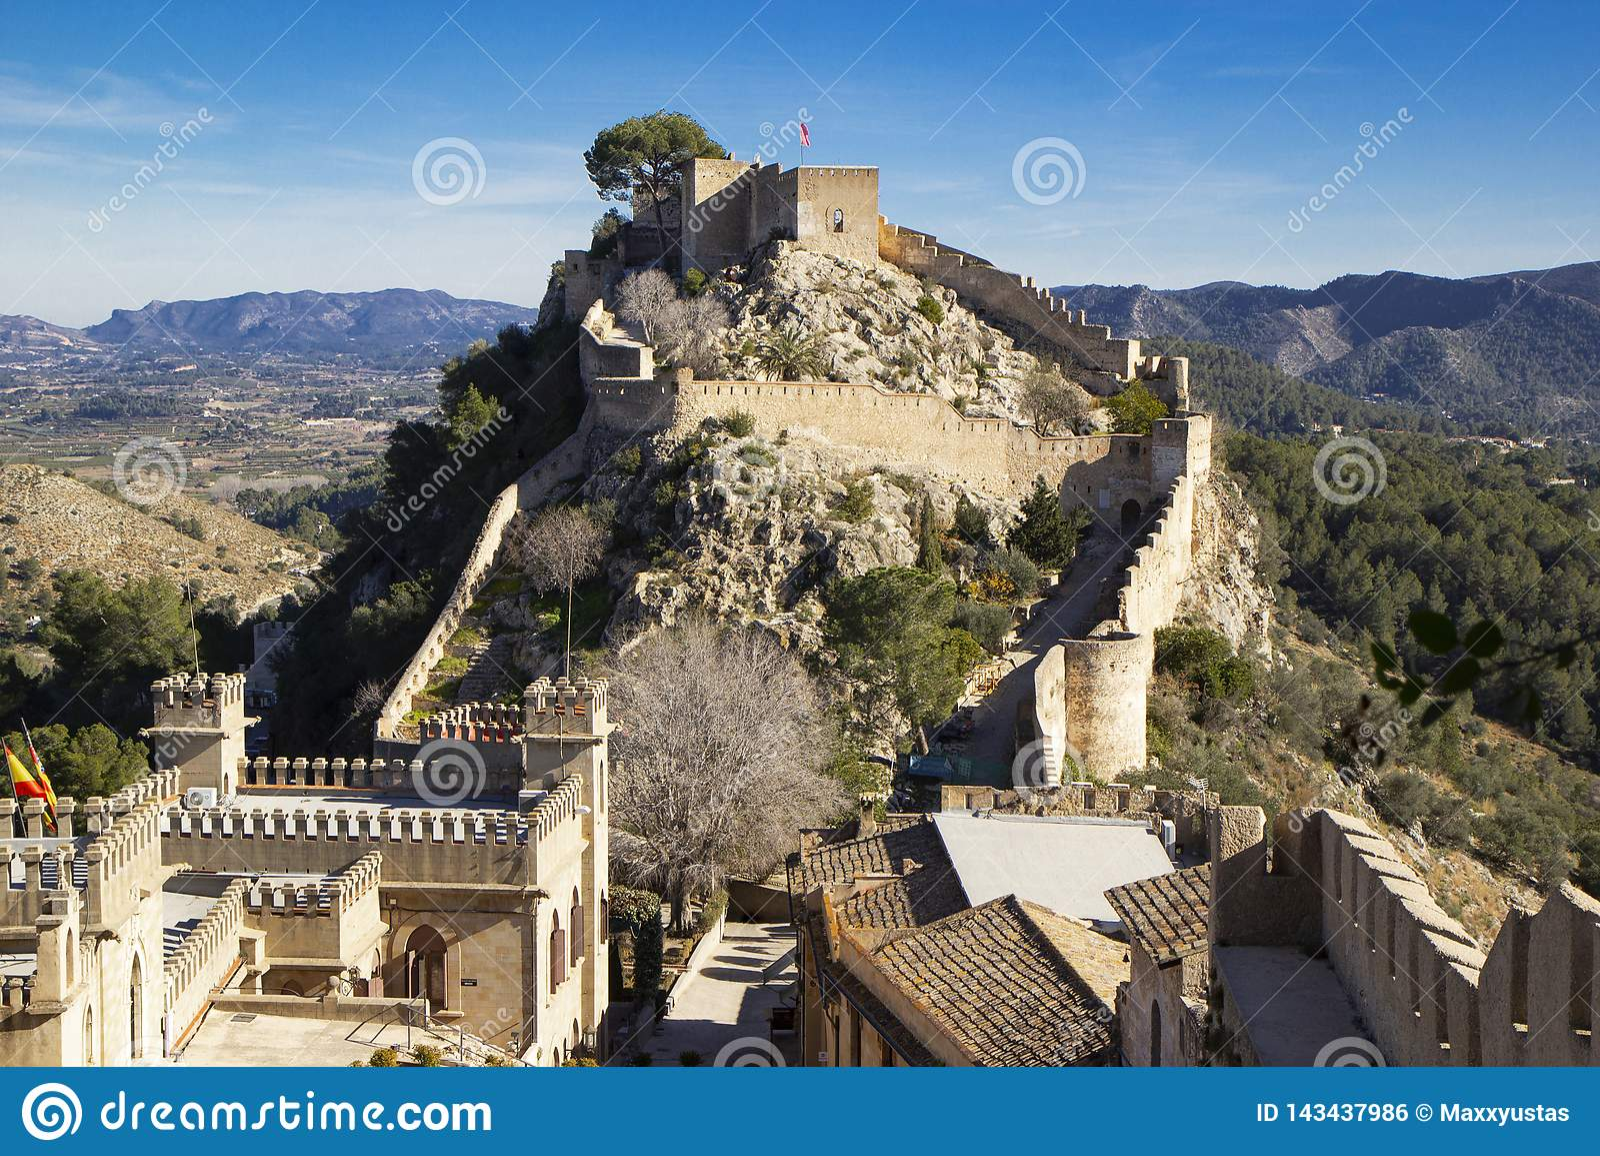 Map Of Xativa Spain.Xativa Castle Valencia Stock Photo Image Of Aerial 143437986